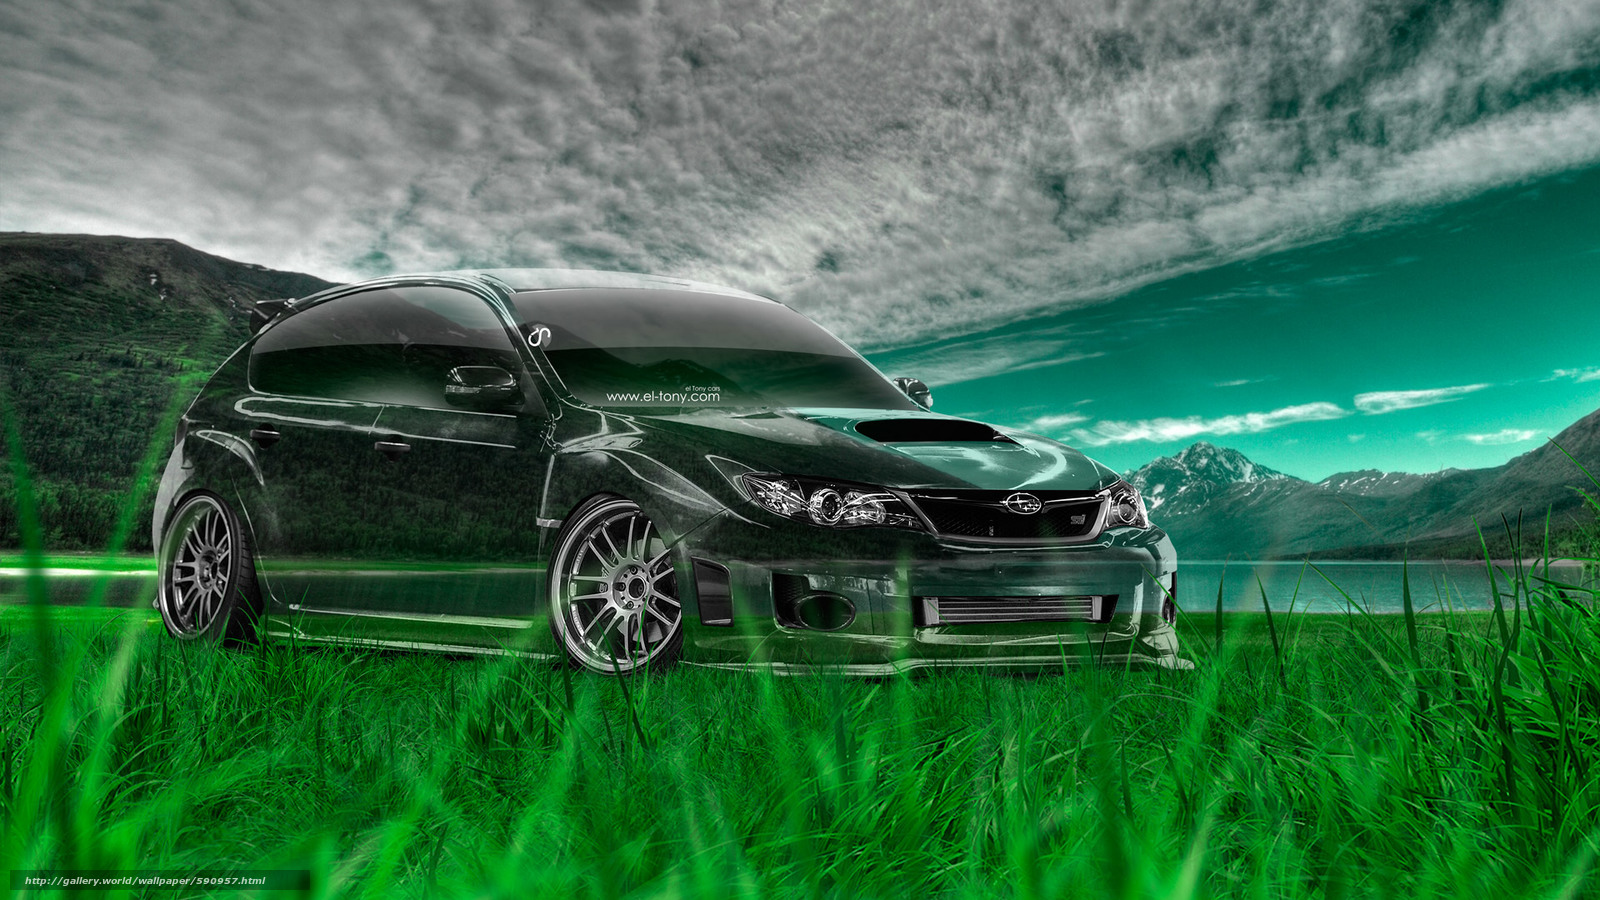 Download wallpaper Tony Kokhan,  Subaru,  Impreza,  WRX free desktop wallpaper in the resolution 1920x1080 — picture №590957